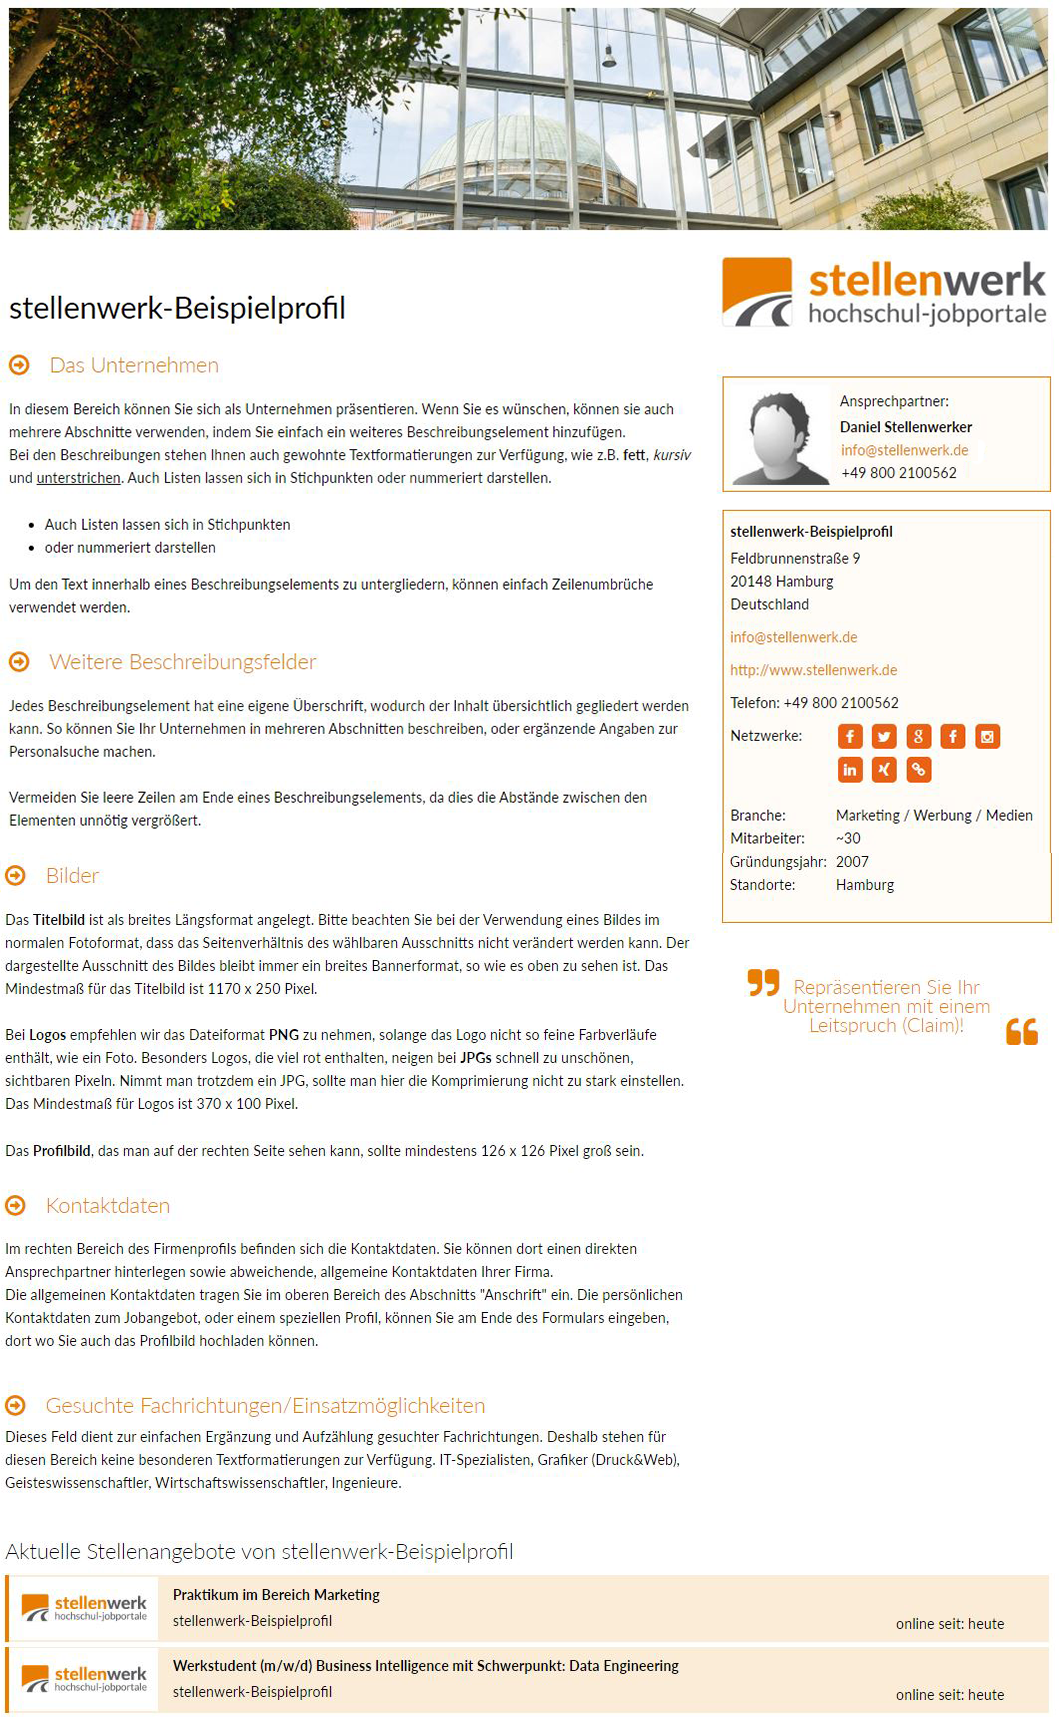 Stellenwerk Firmenprofil Beispiel